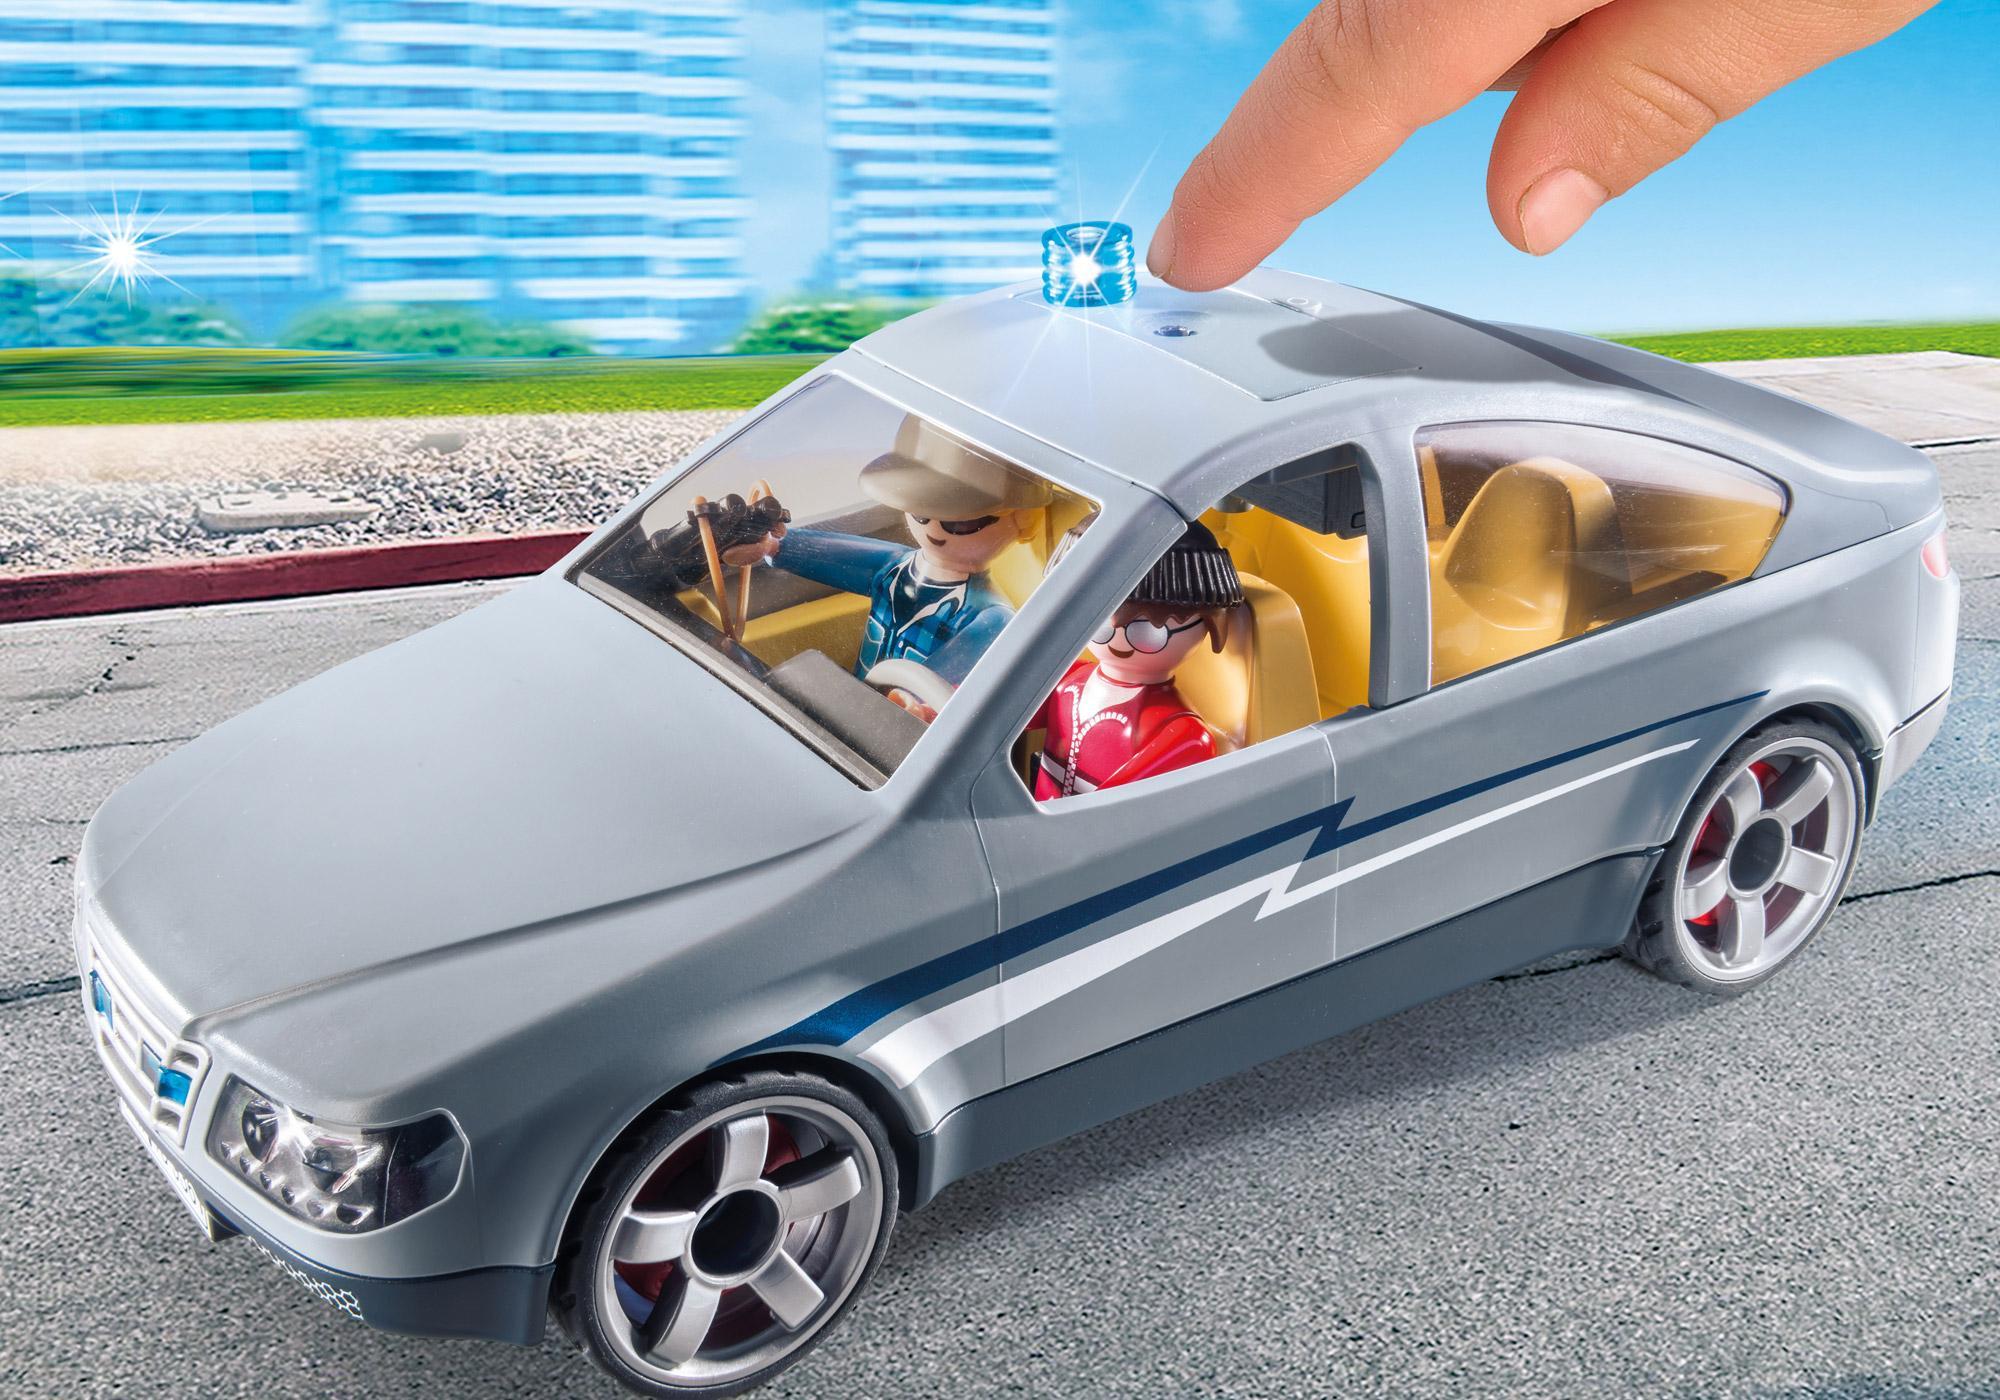 http://media.playmobil.com/i/playmobil/9361_product_extra2/Αυτοκίνητο Μονάδας Ειδικών Αποστολών